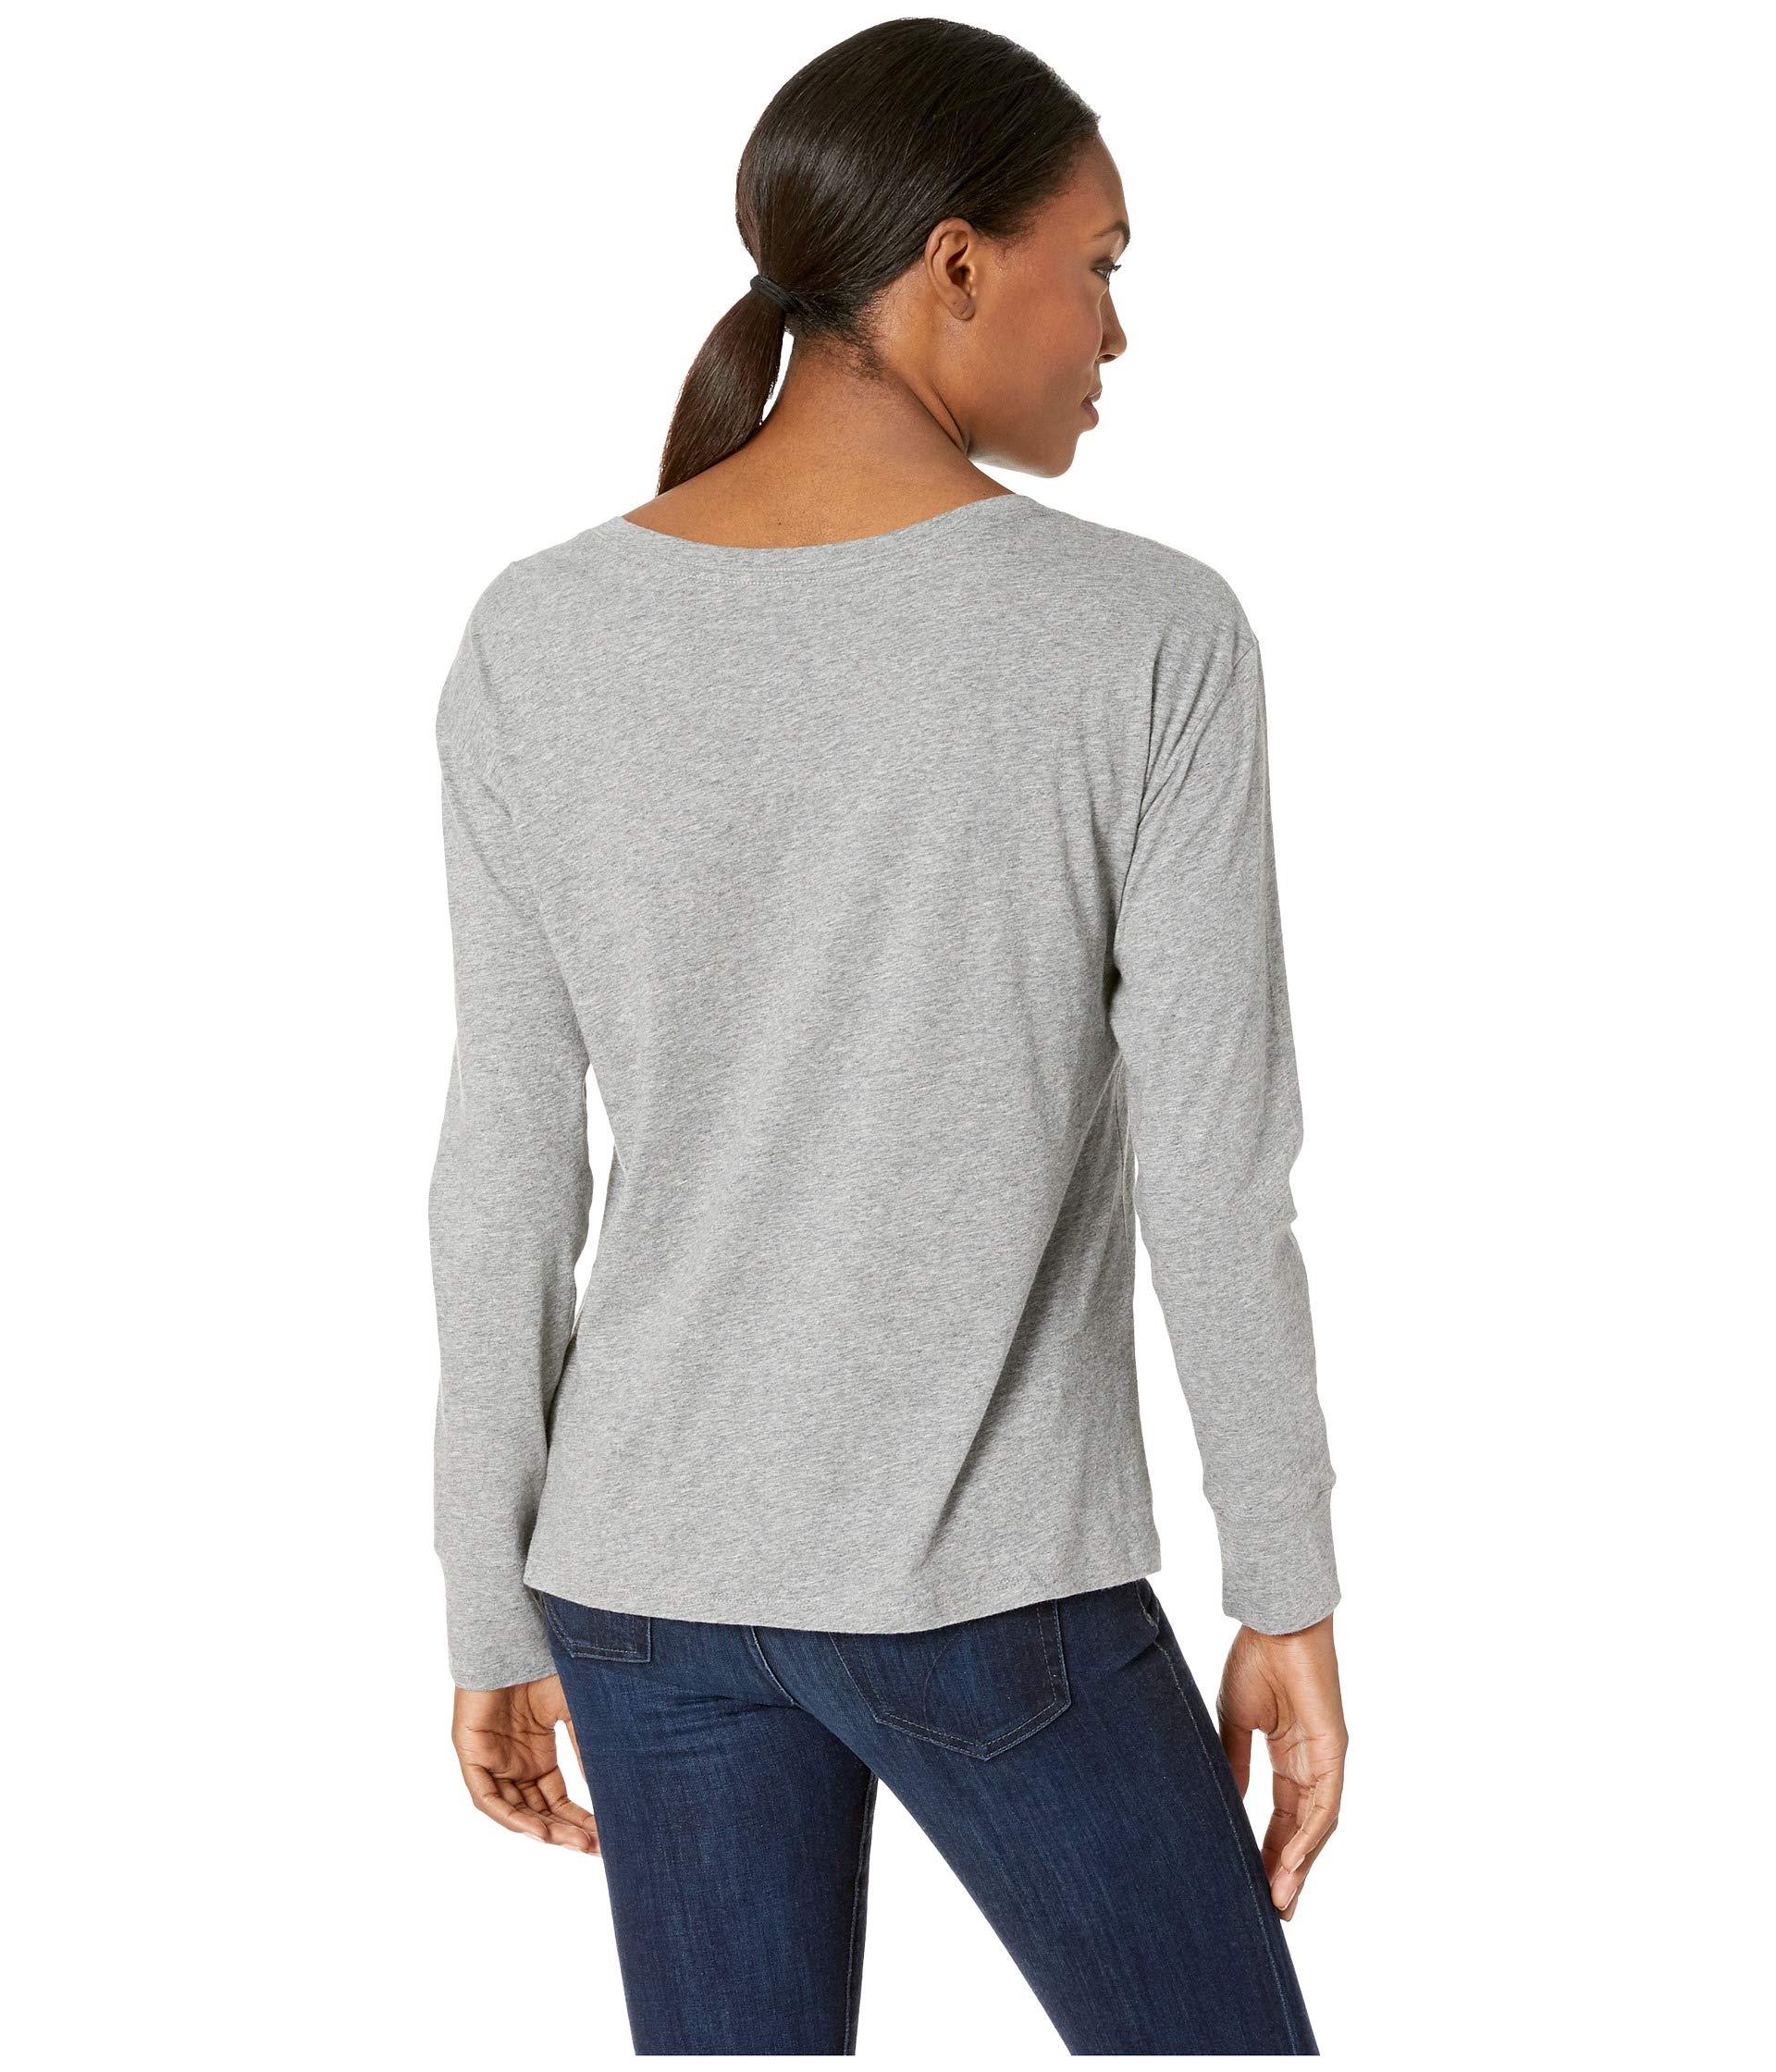 shirt Breezy Heather Life Truck Sleeve Long Love Is Good Gray T gxaqBT